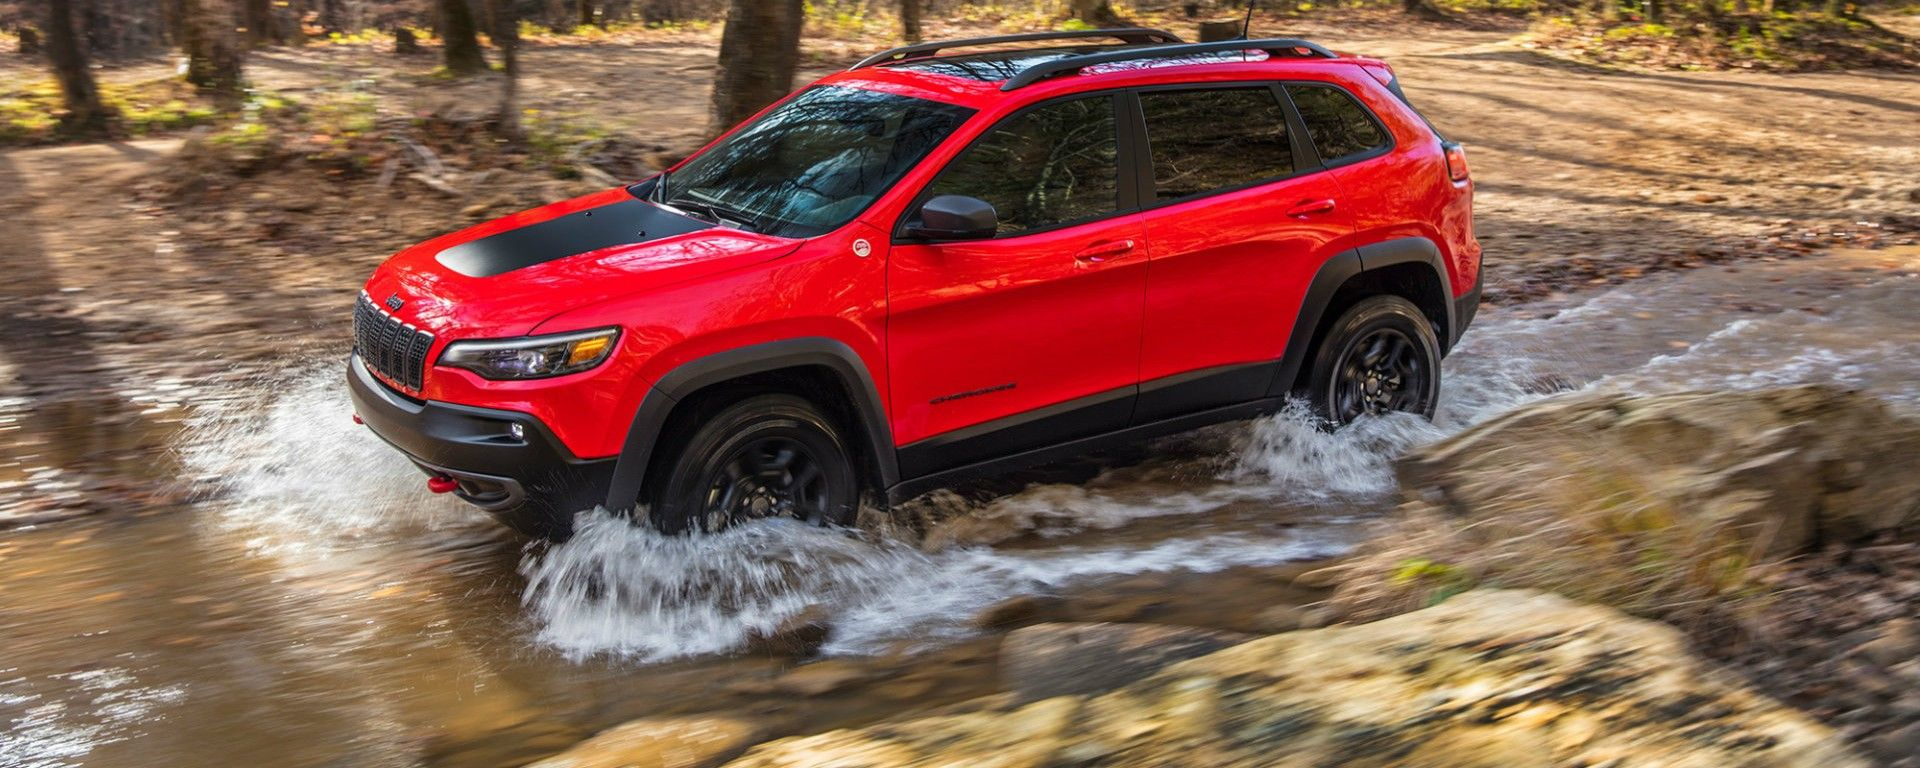 Nuova Jeep Cherokee Trailhawk